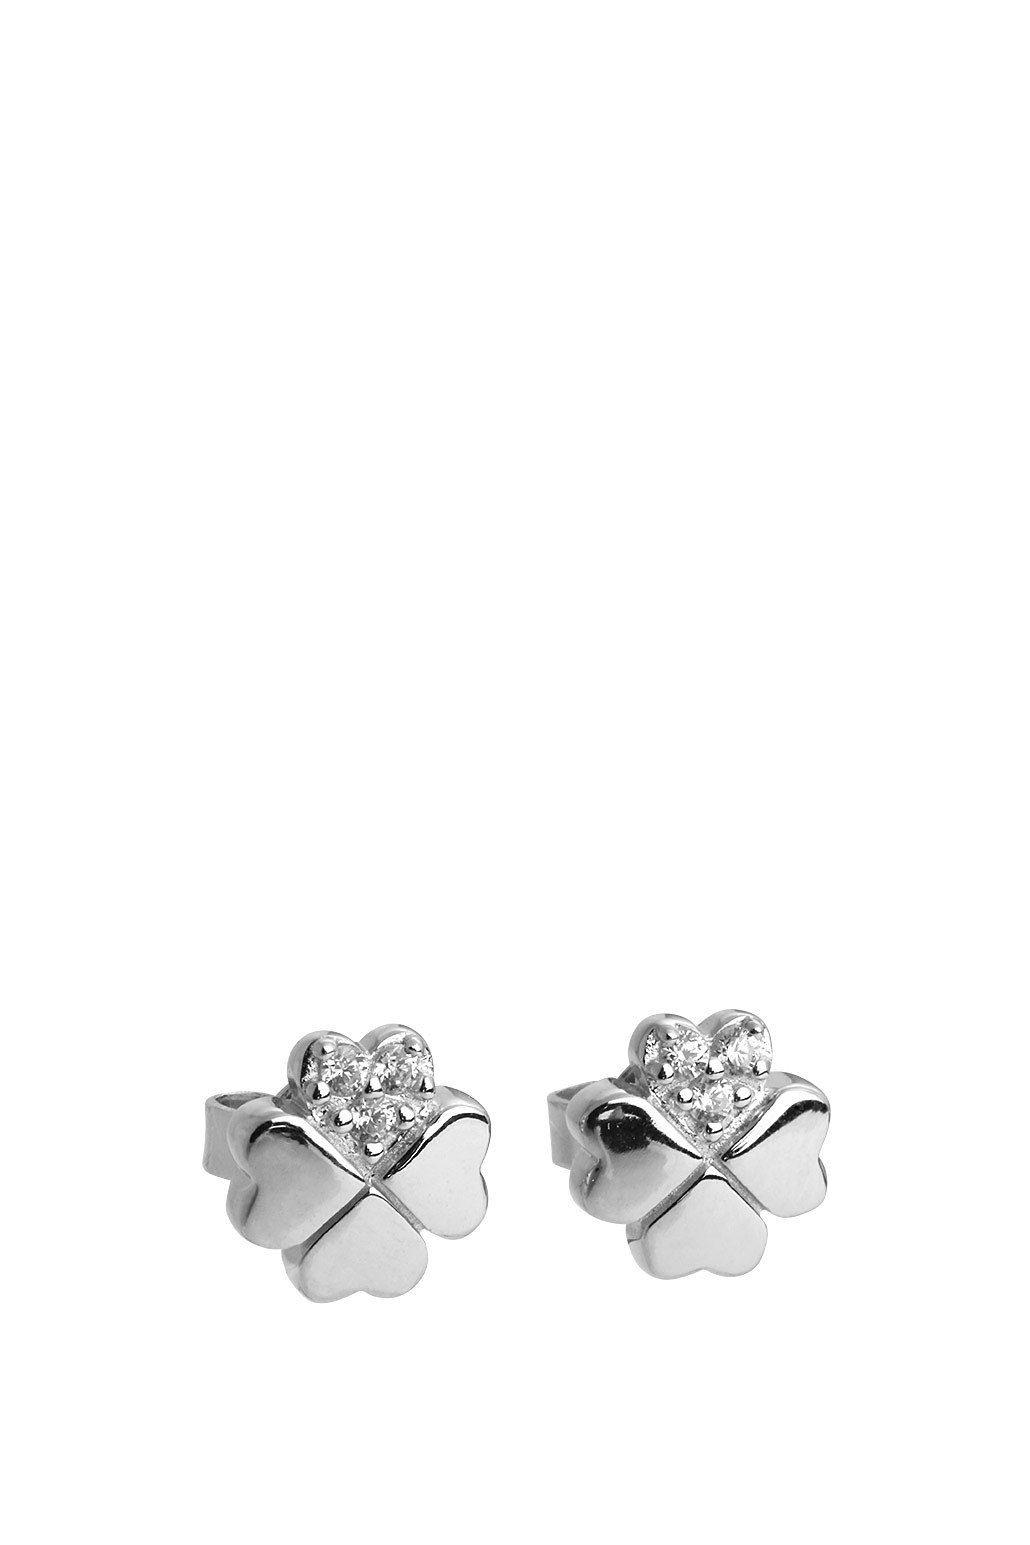 ESPRIT CASUAL Sterling Silber / Zirkonia Ohrringe